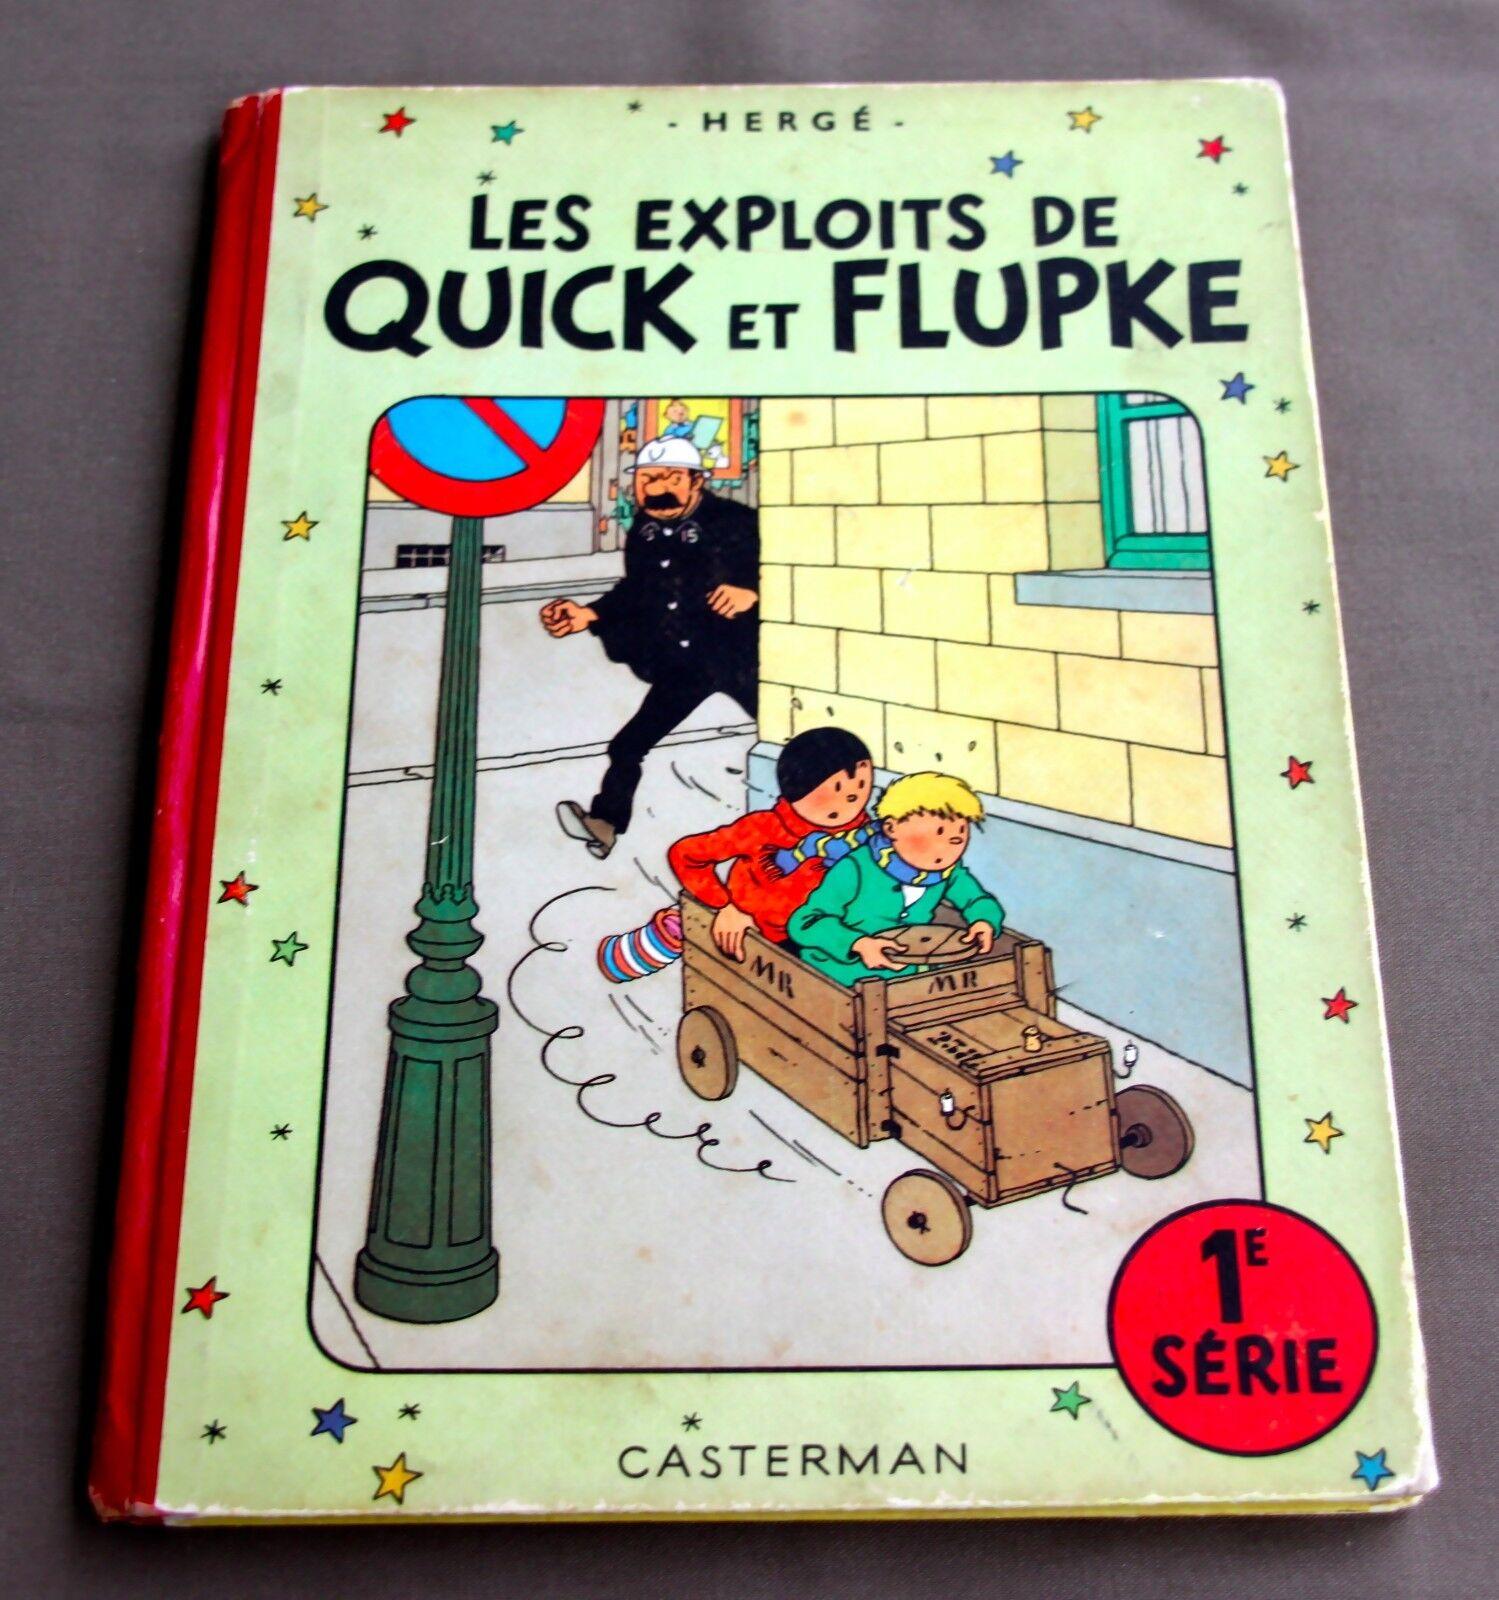 HERGE - LES EXPLOITS DE  QUICK ET  FLUPKE  1E SERIE - 1950 - B4